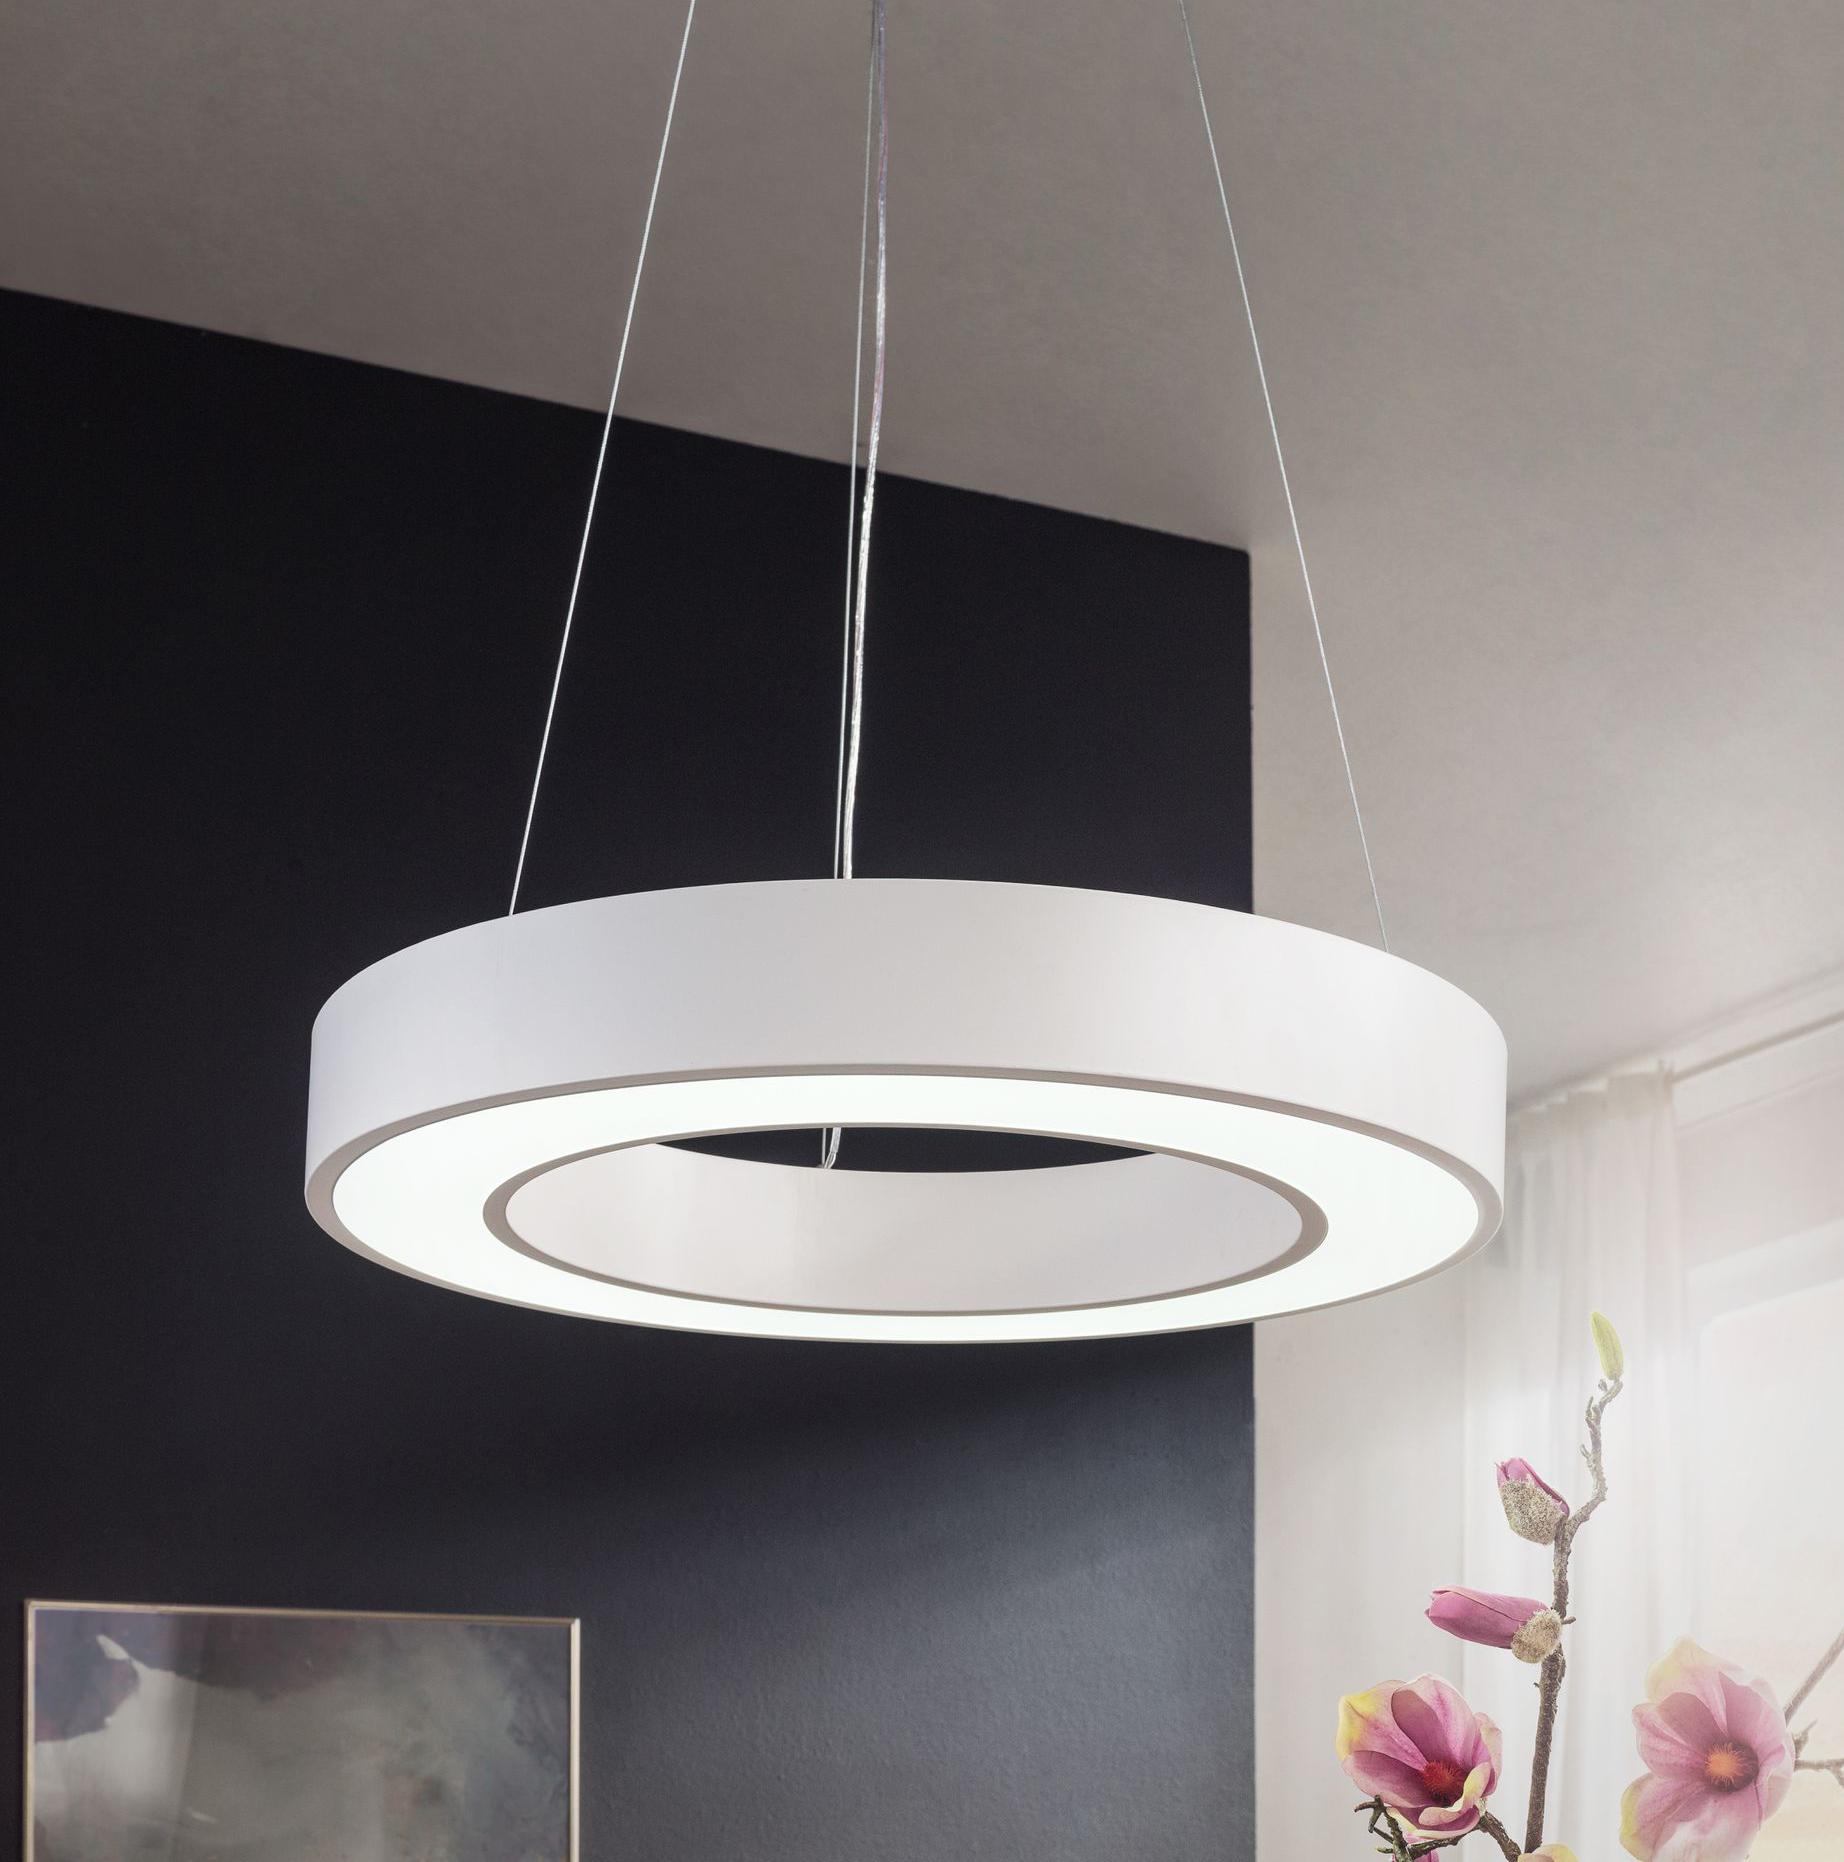 LED závěsné svítidlo Circle, 60 cm, bílá